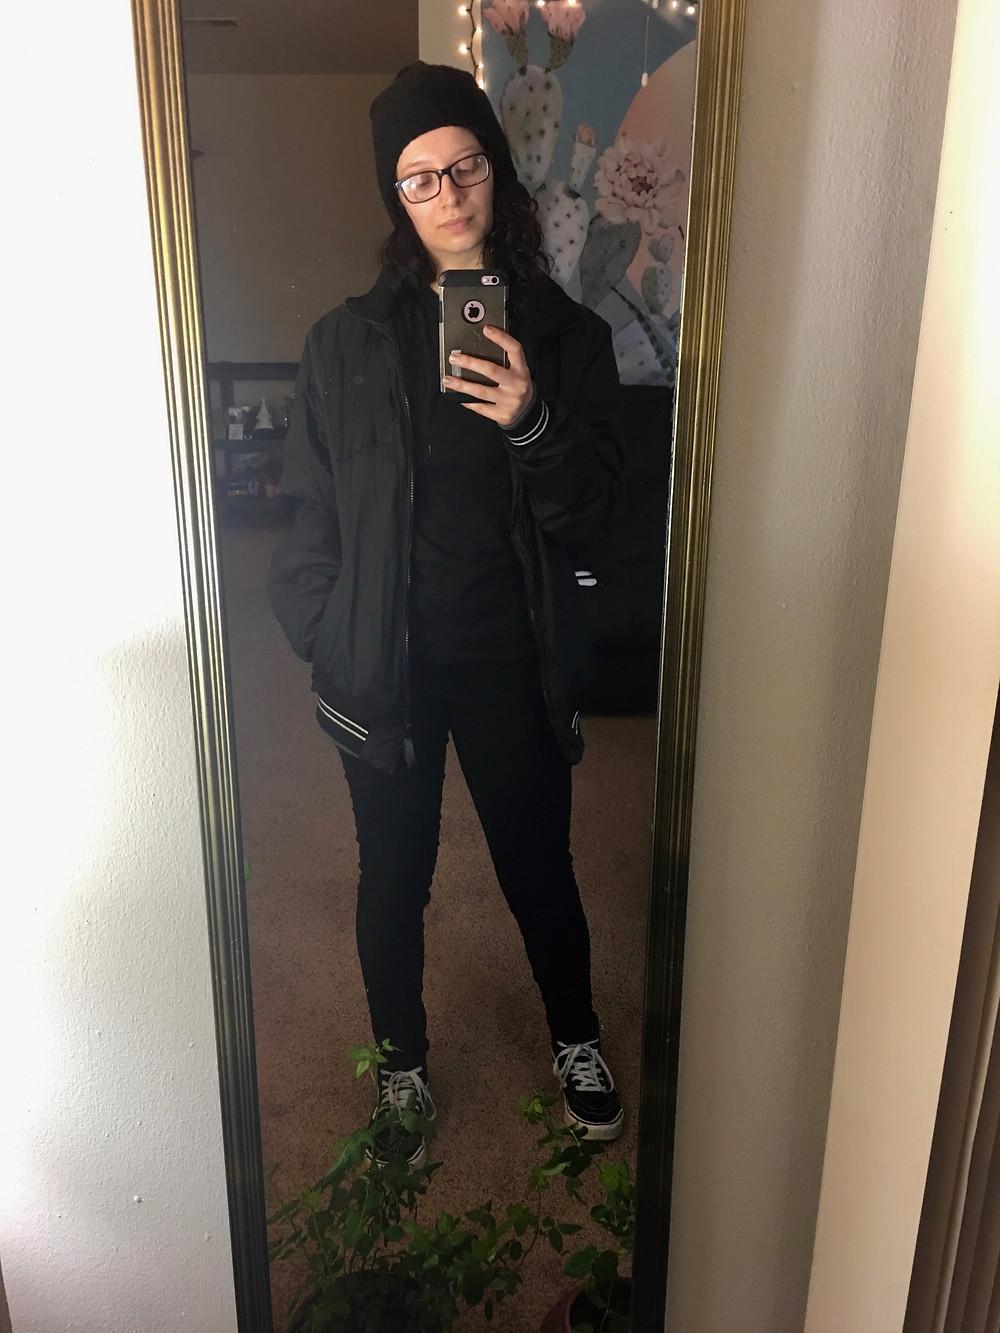 Same shirt, same jeans, same shoes, plus a beanie and my boyfriend's jacket